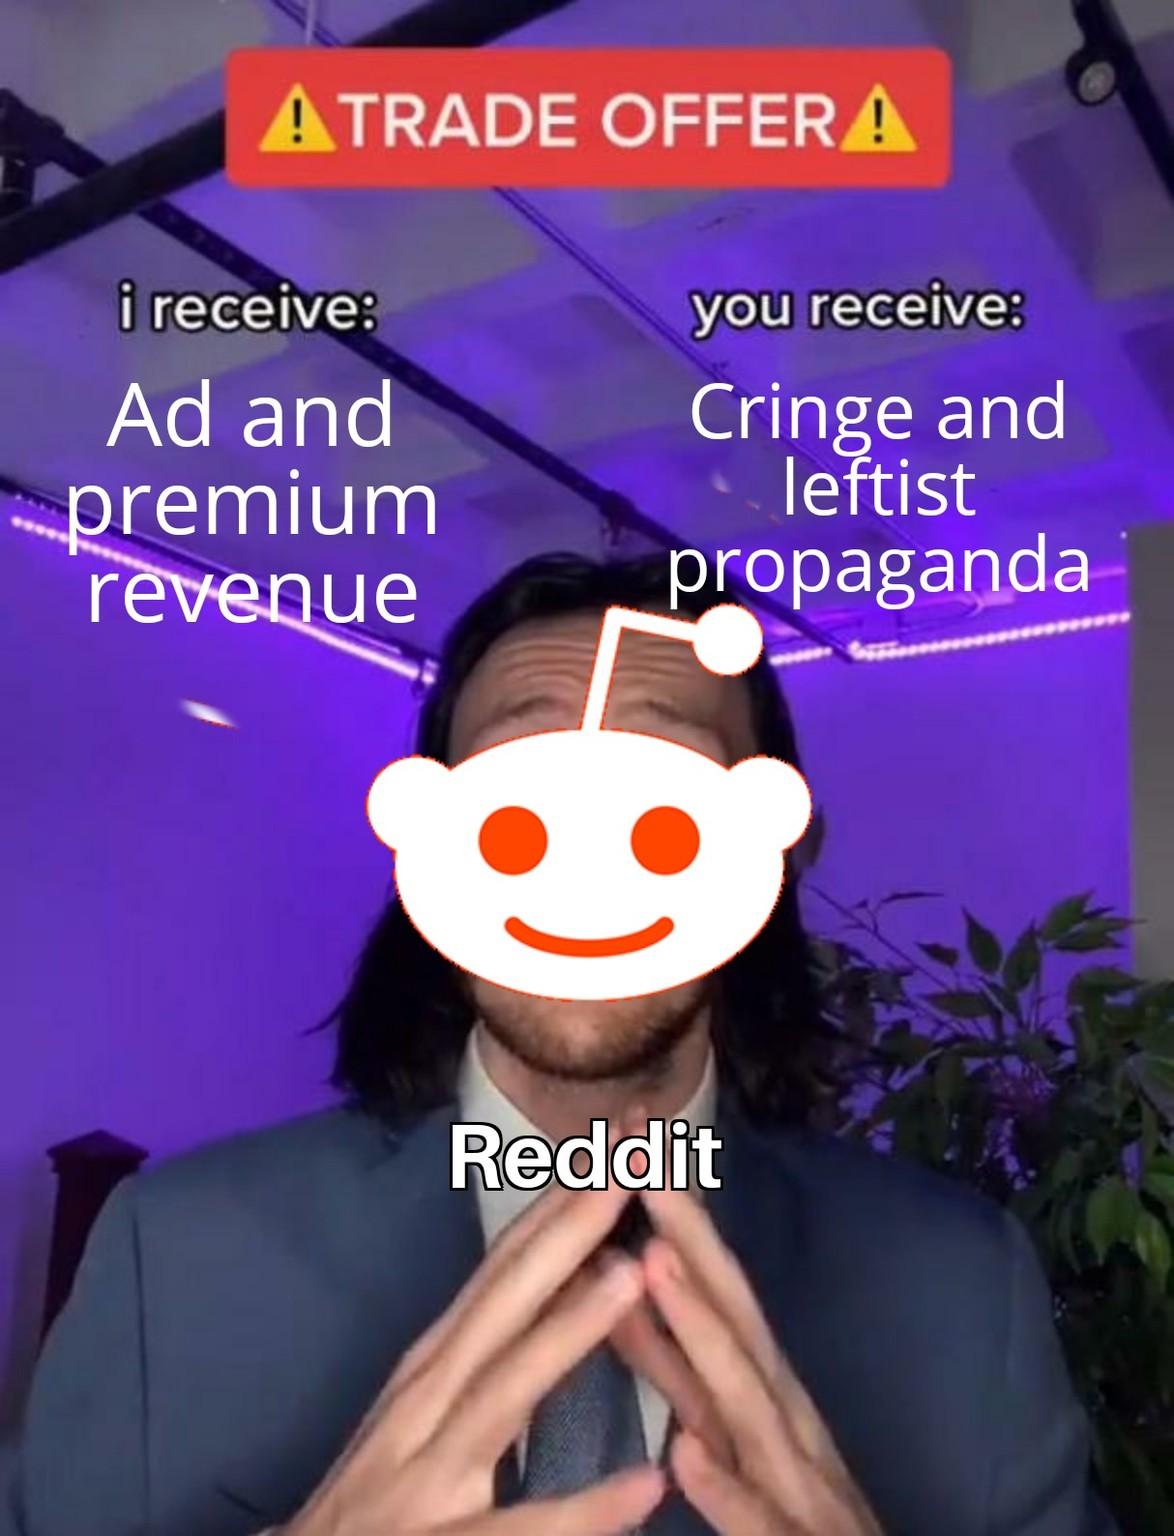 Oc maymay for the superior platform - meme